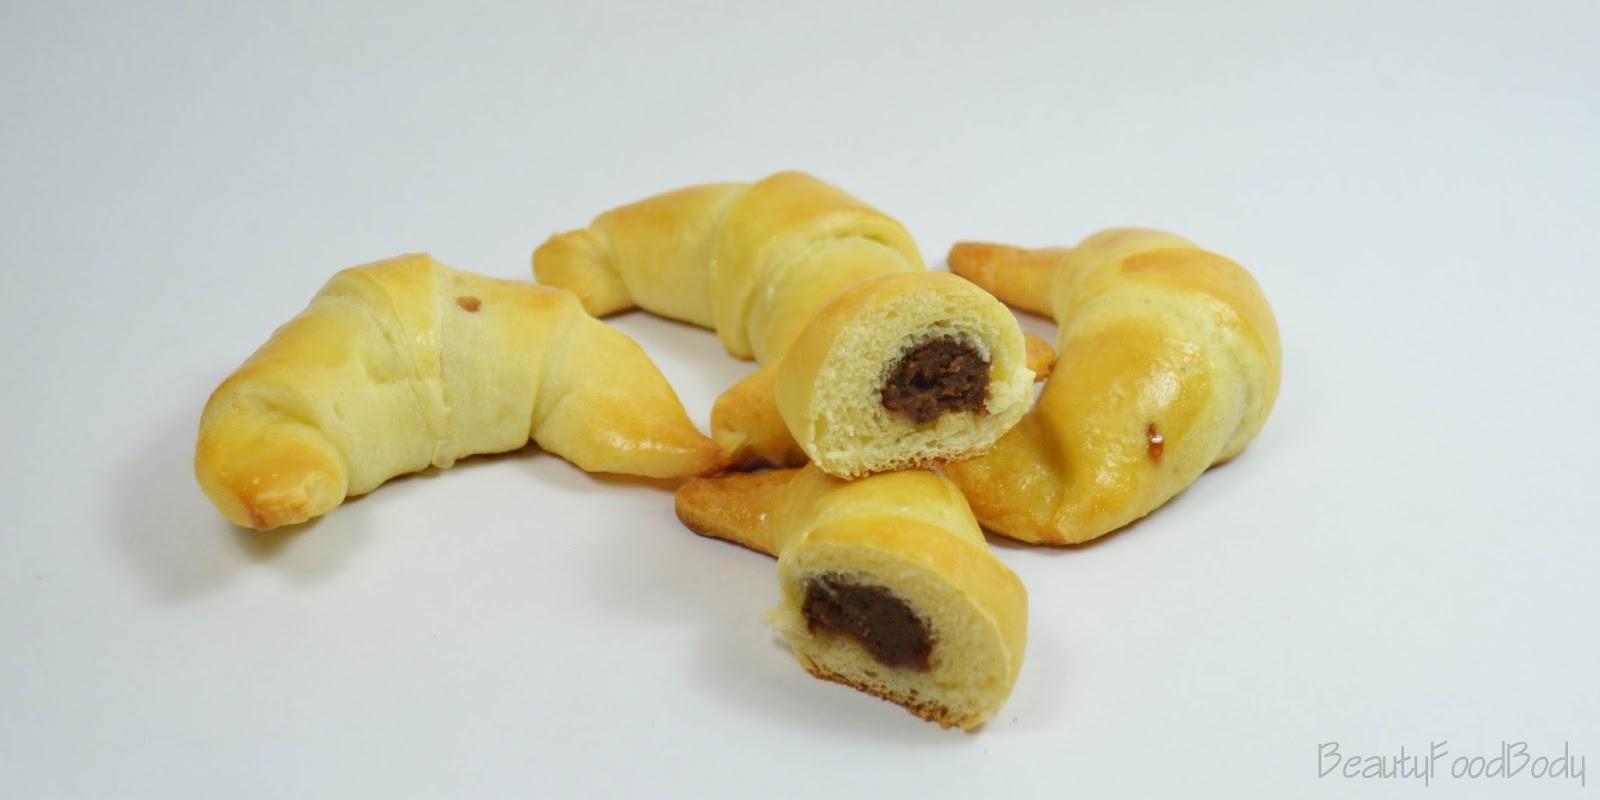 rubibeauty receta croissants rellenos beautyfoodbody